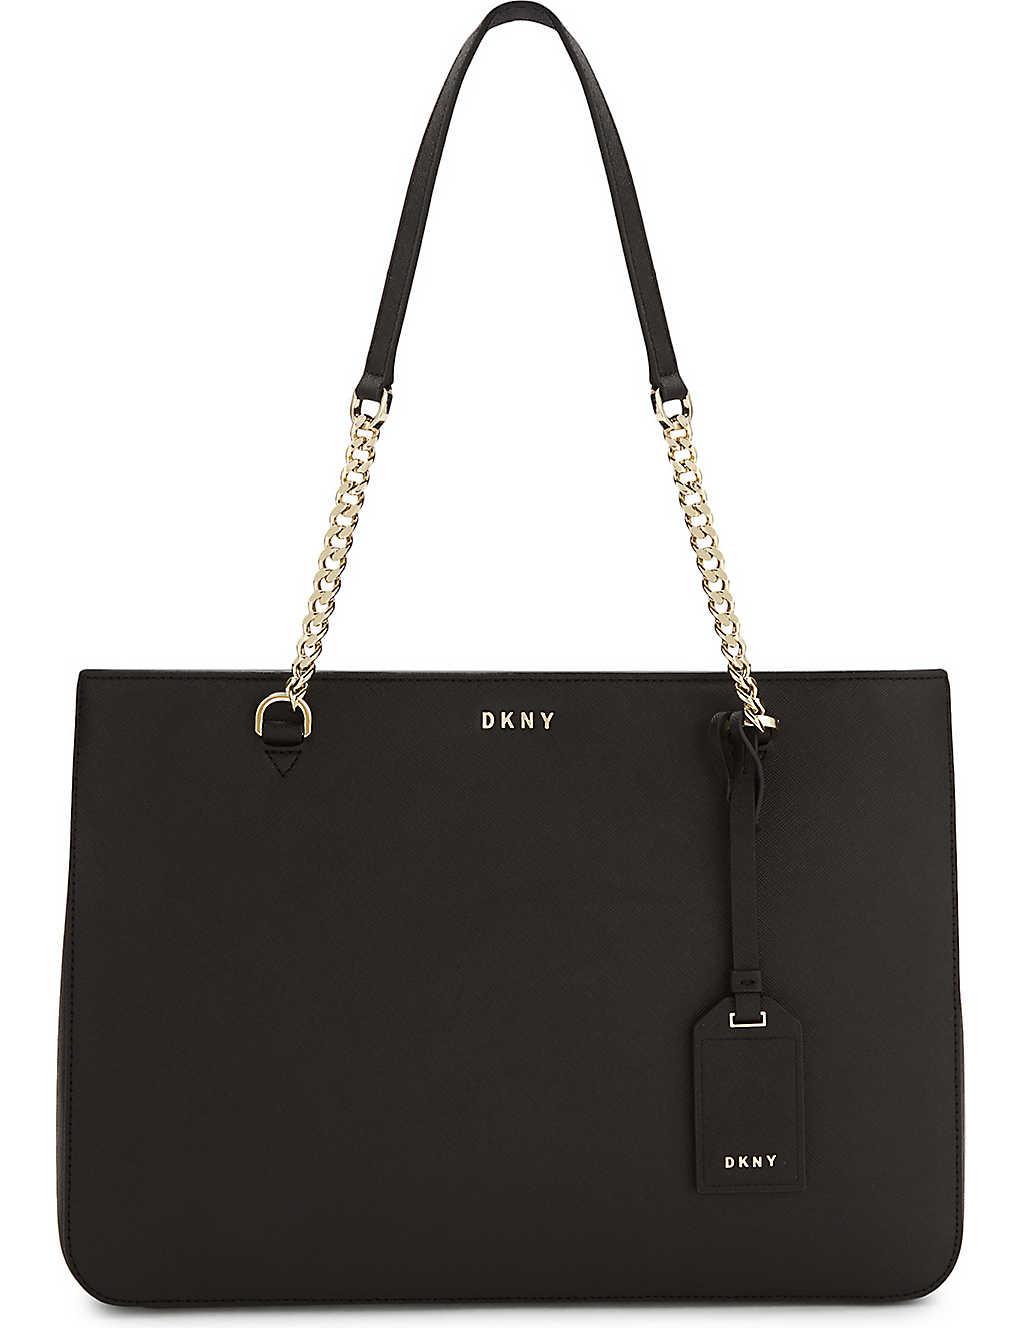 DKNY - Bryant Park Saffiano leather shoulder bag | Selfridges.com